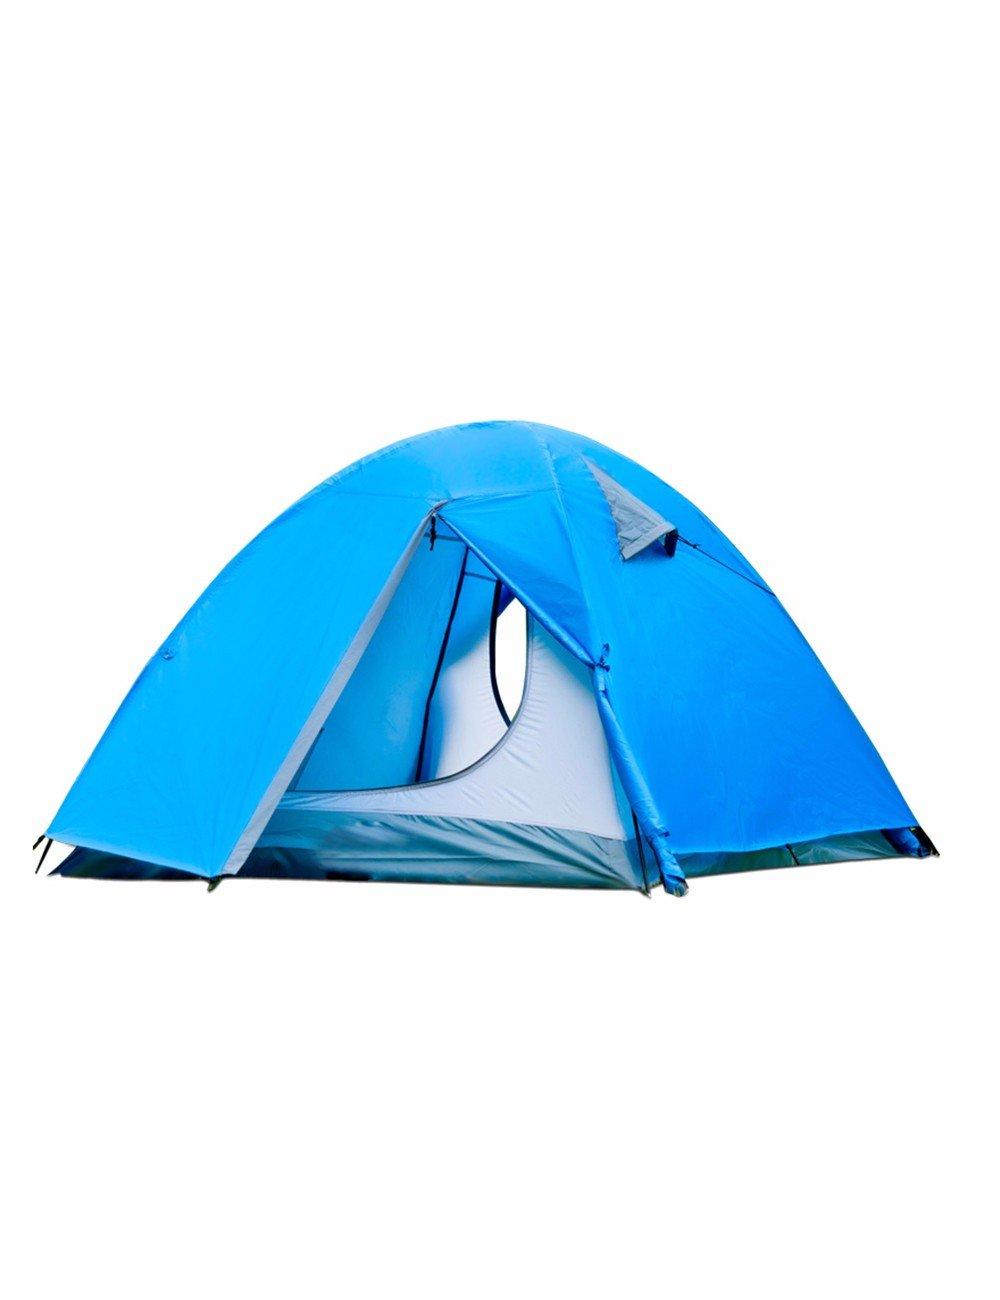 SJQKA-Zelt Double Double winddicht und wasserdicht Campingplatz Camping Outdoor Equipment